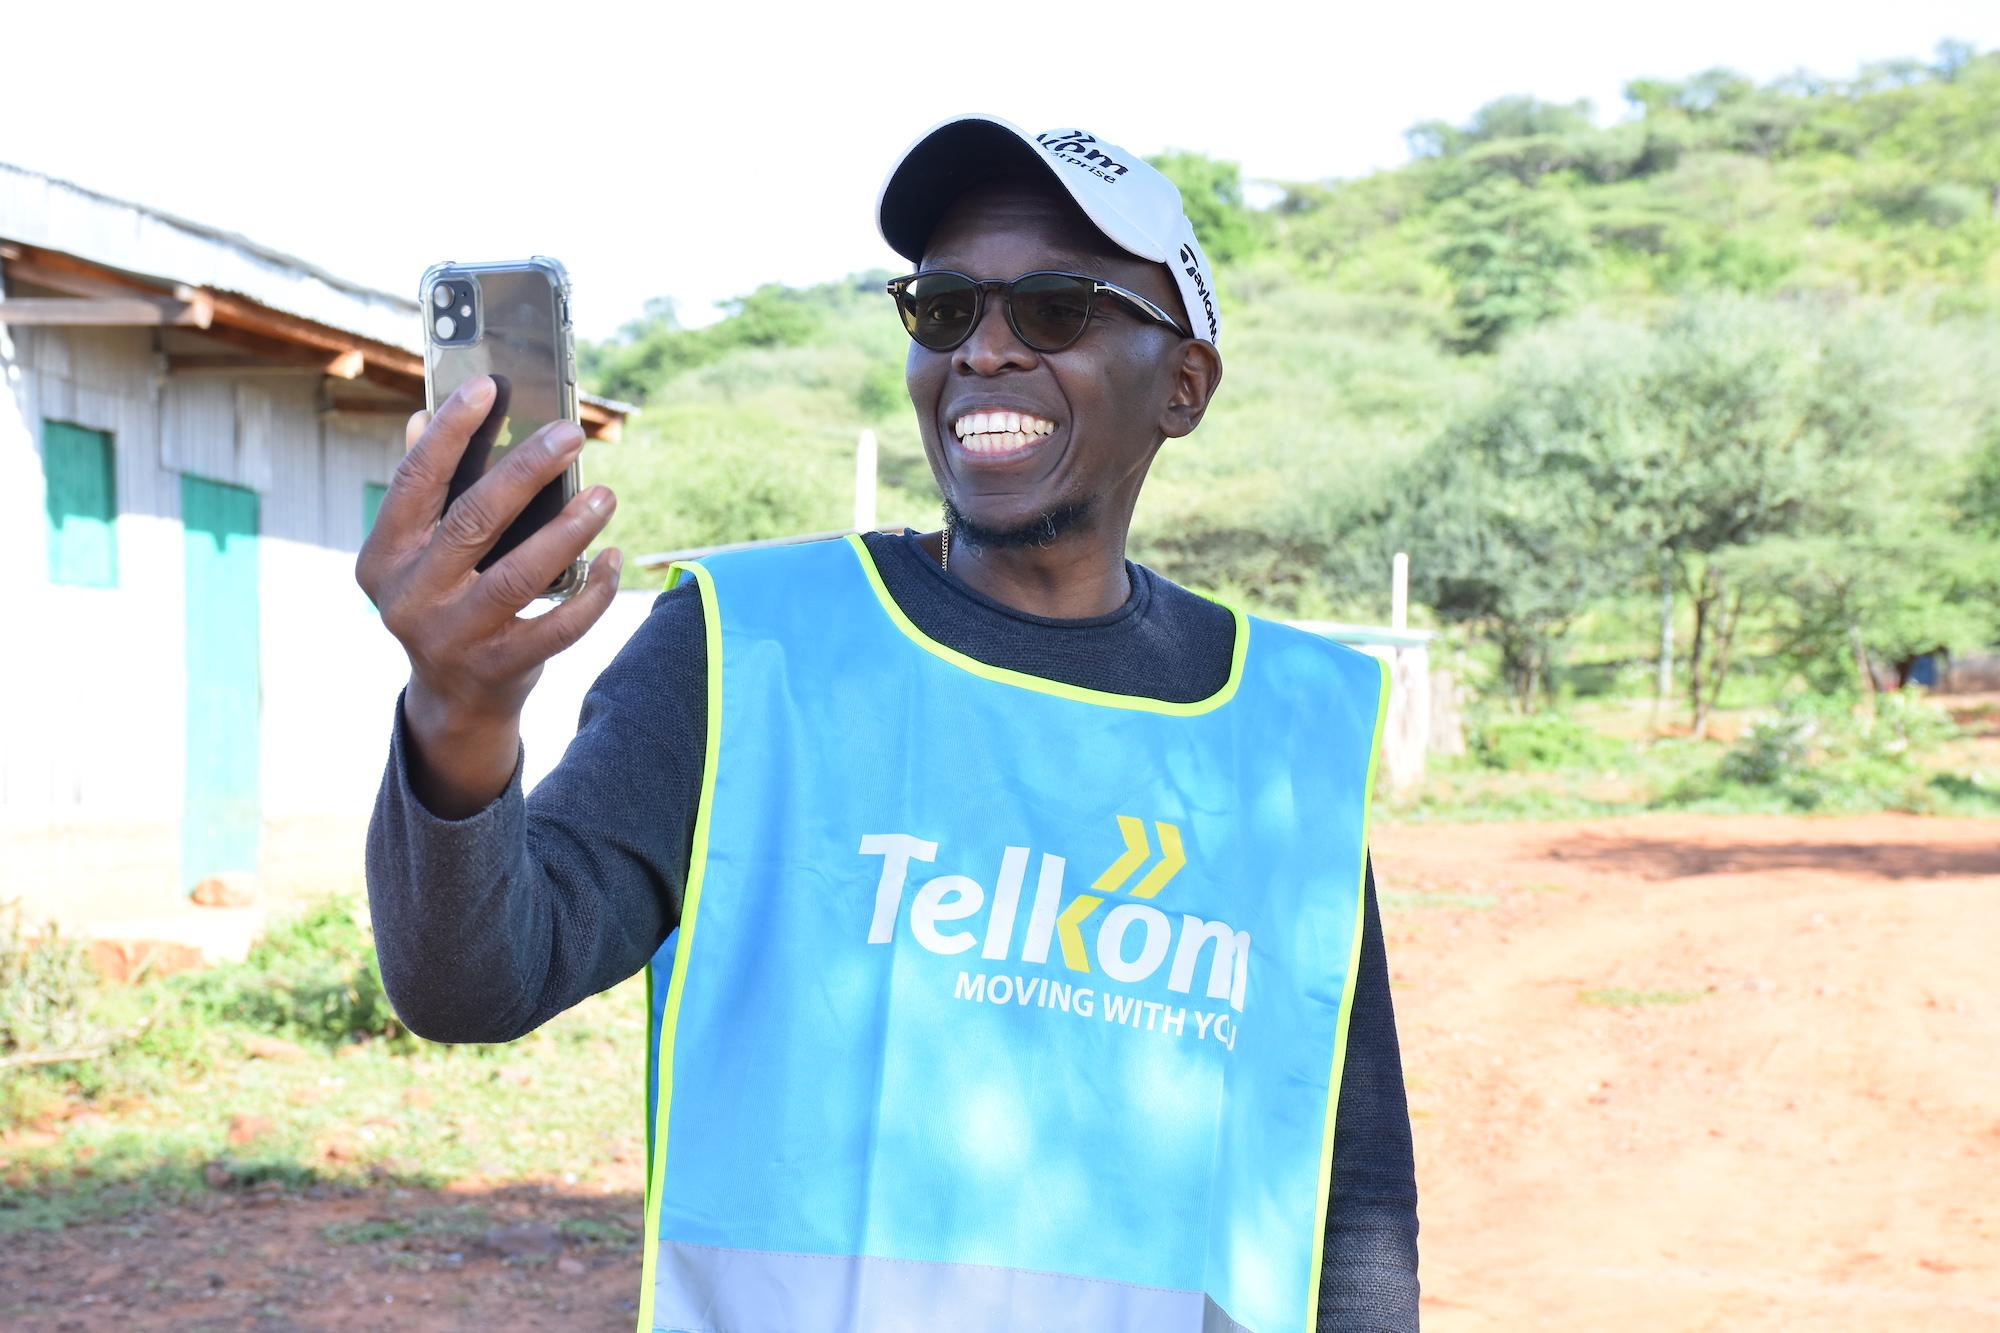 Alphabet's Loon launches its balloon-powered Kenyan internet service